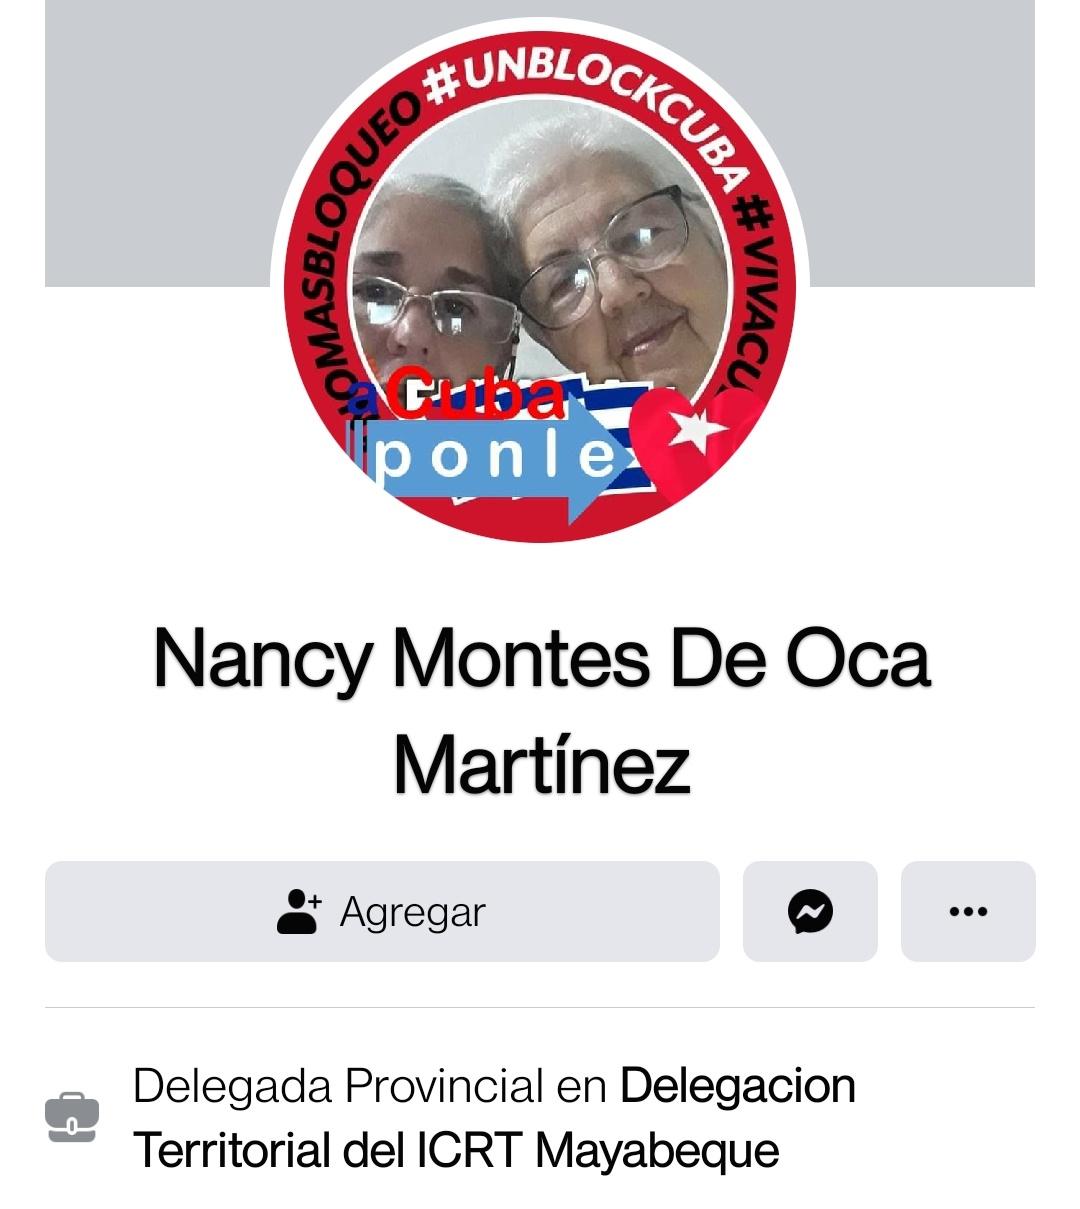 Nancy Montes de Oca Martinez